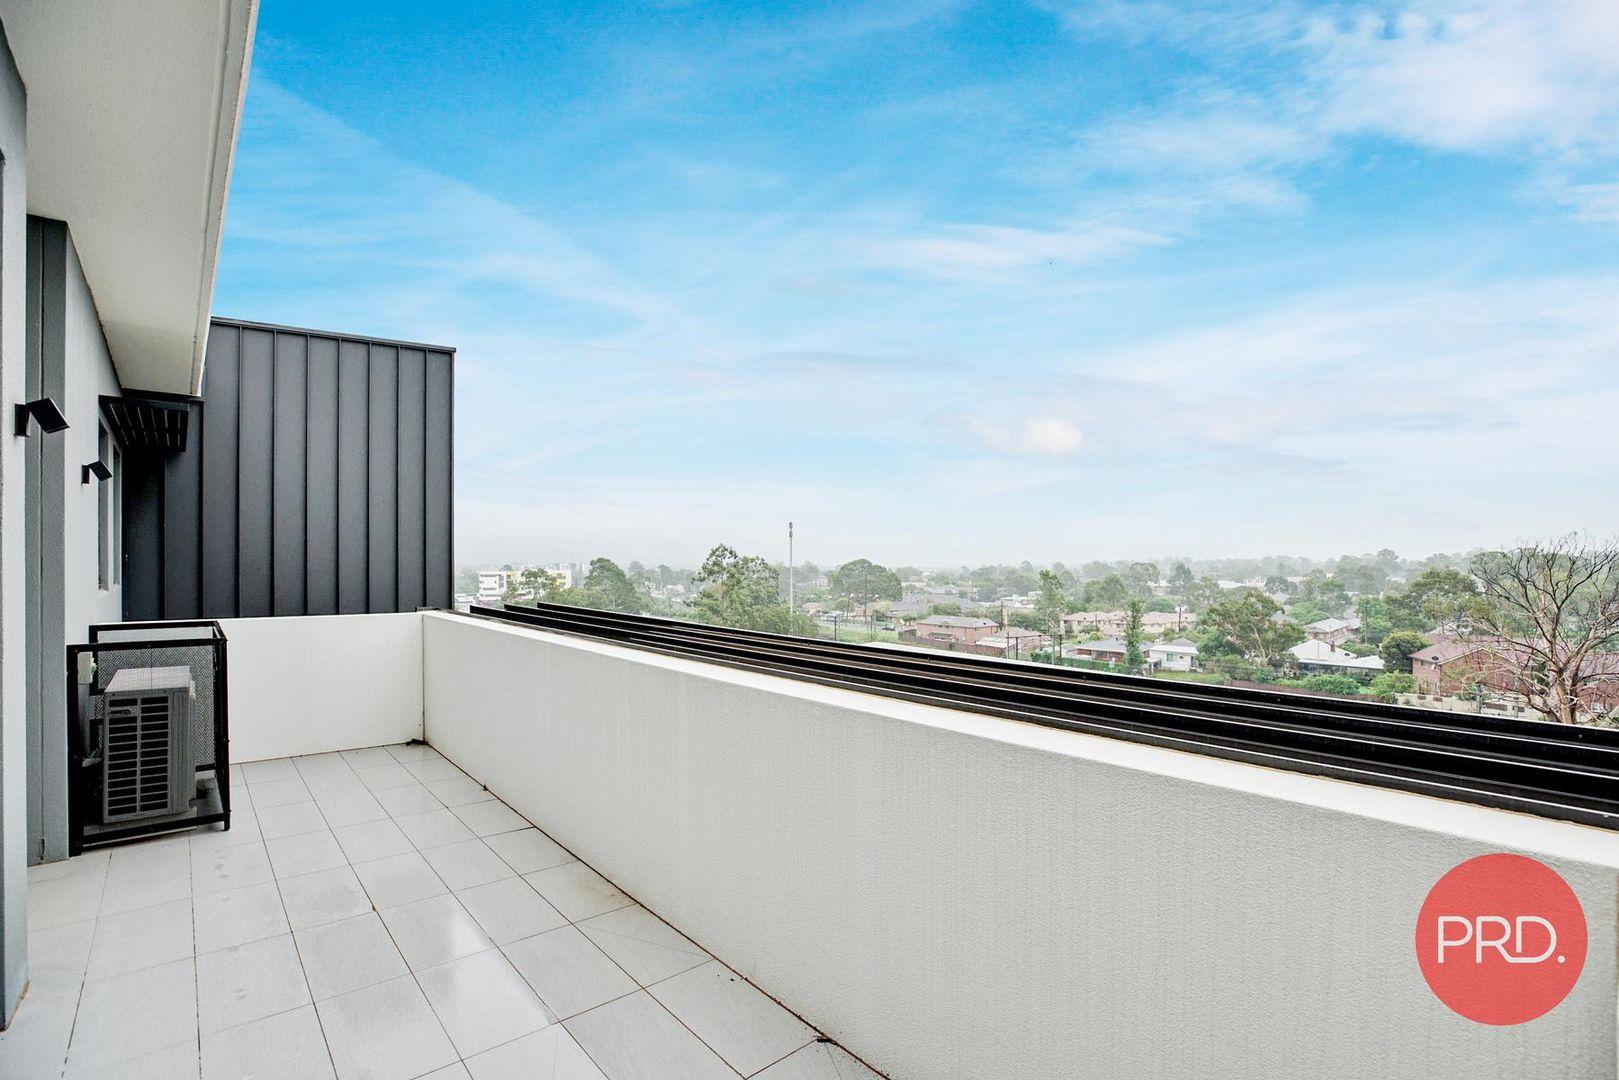 53/144-148 High Street, Penrith NSW 2750, Image 0